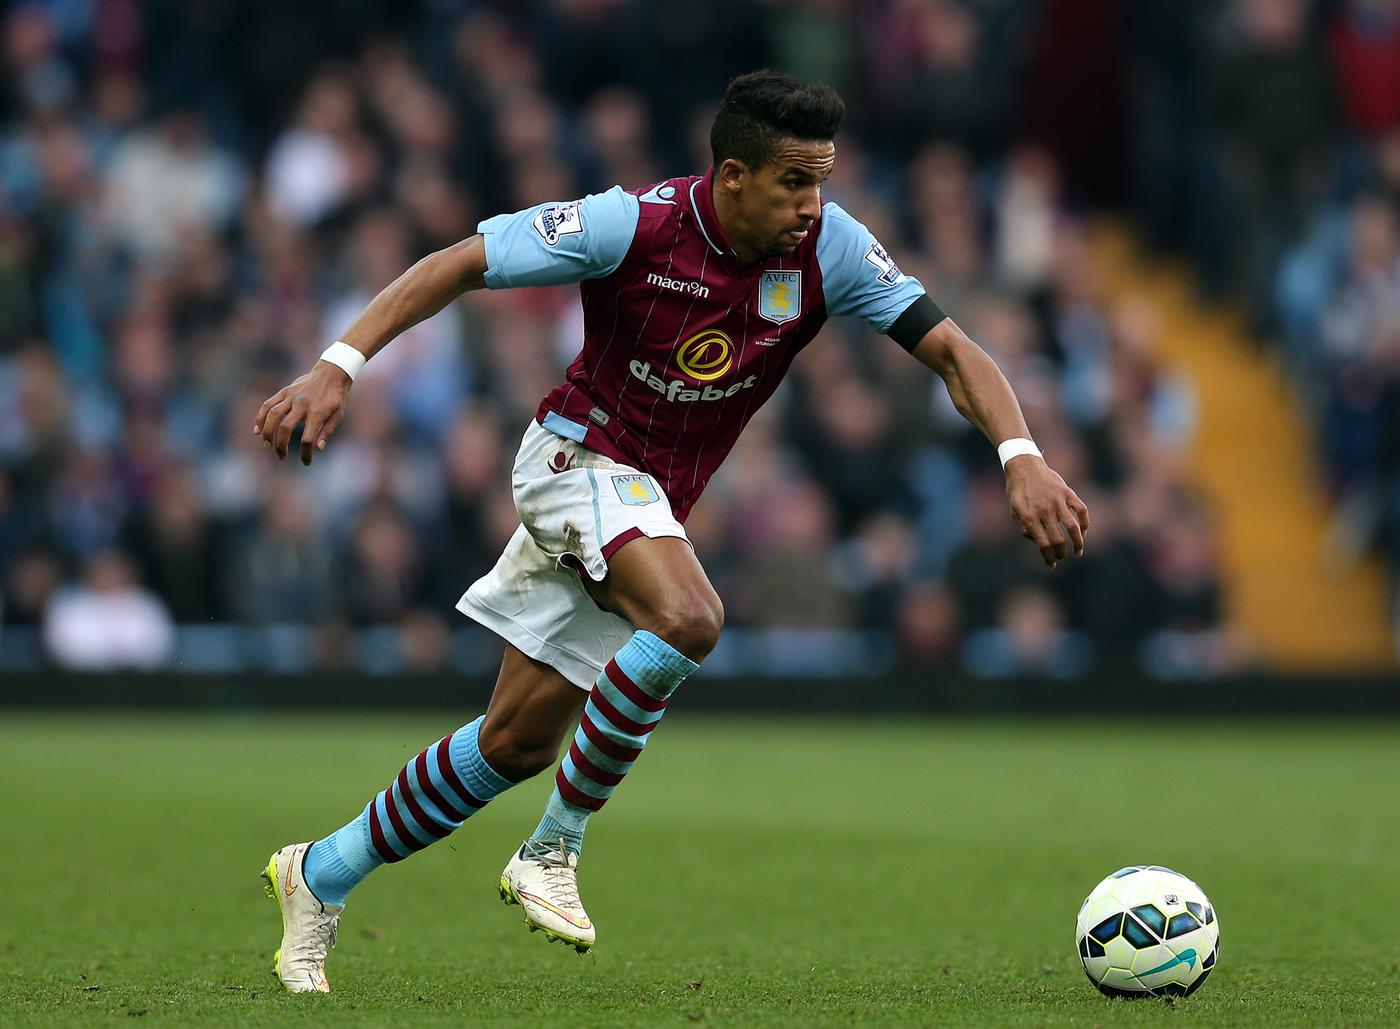 Manchester City's Scott Sinclair keen to make Aston Villa switch permanent despite West Ham and QPR interest